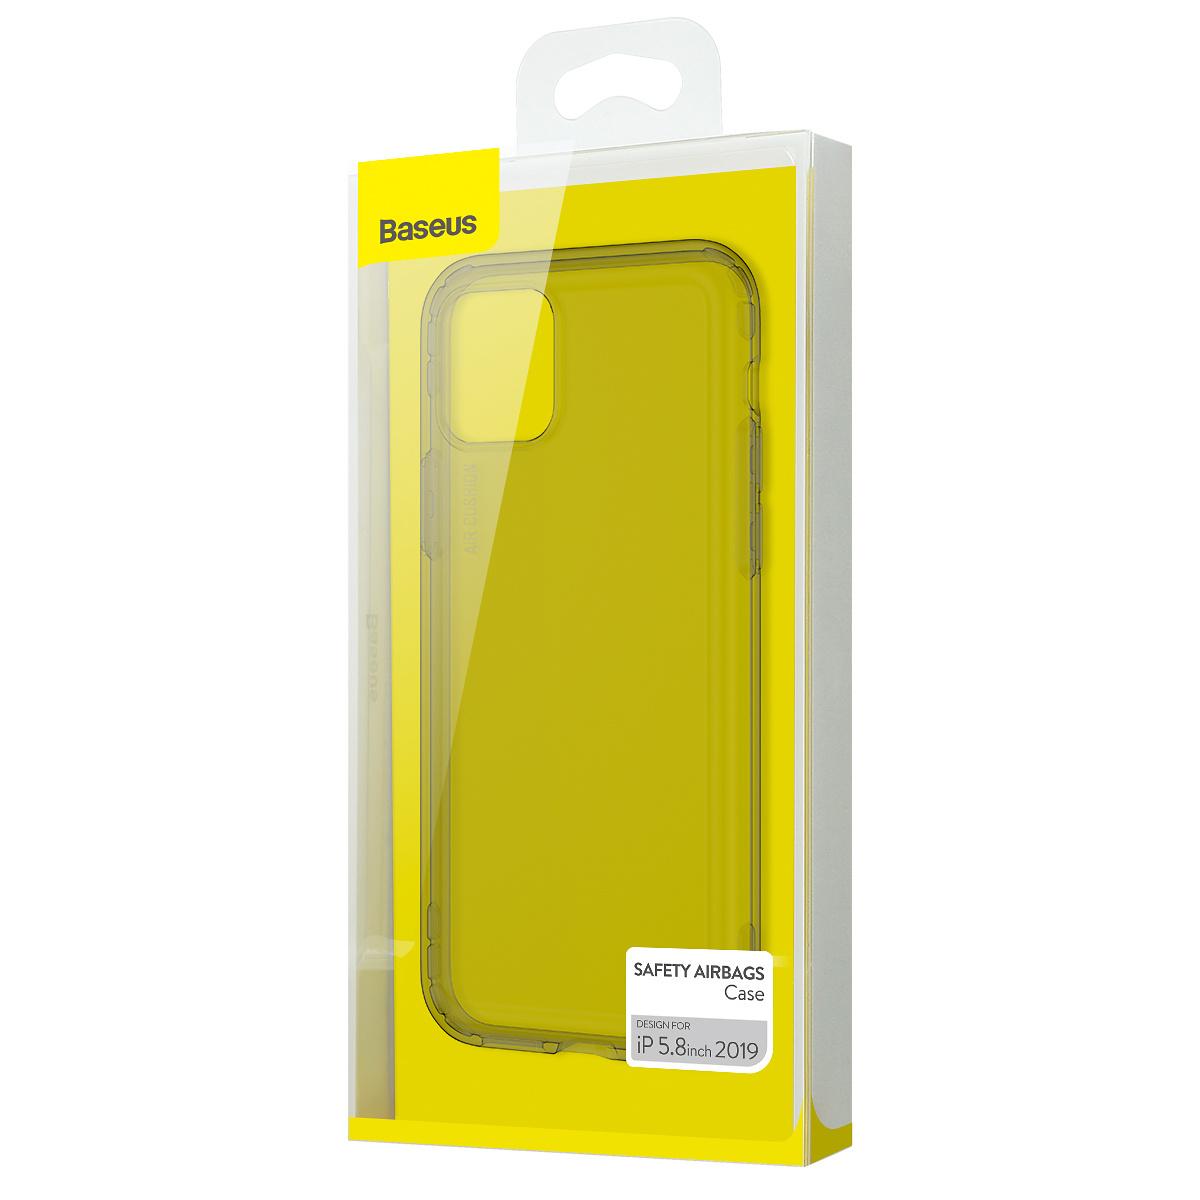 BASEUS stötsäkert TPU-skal, iPhone 11 Pro, svart/transparent